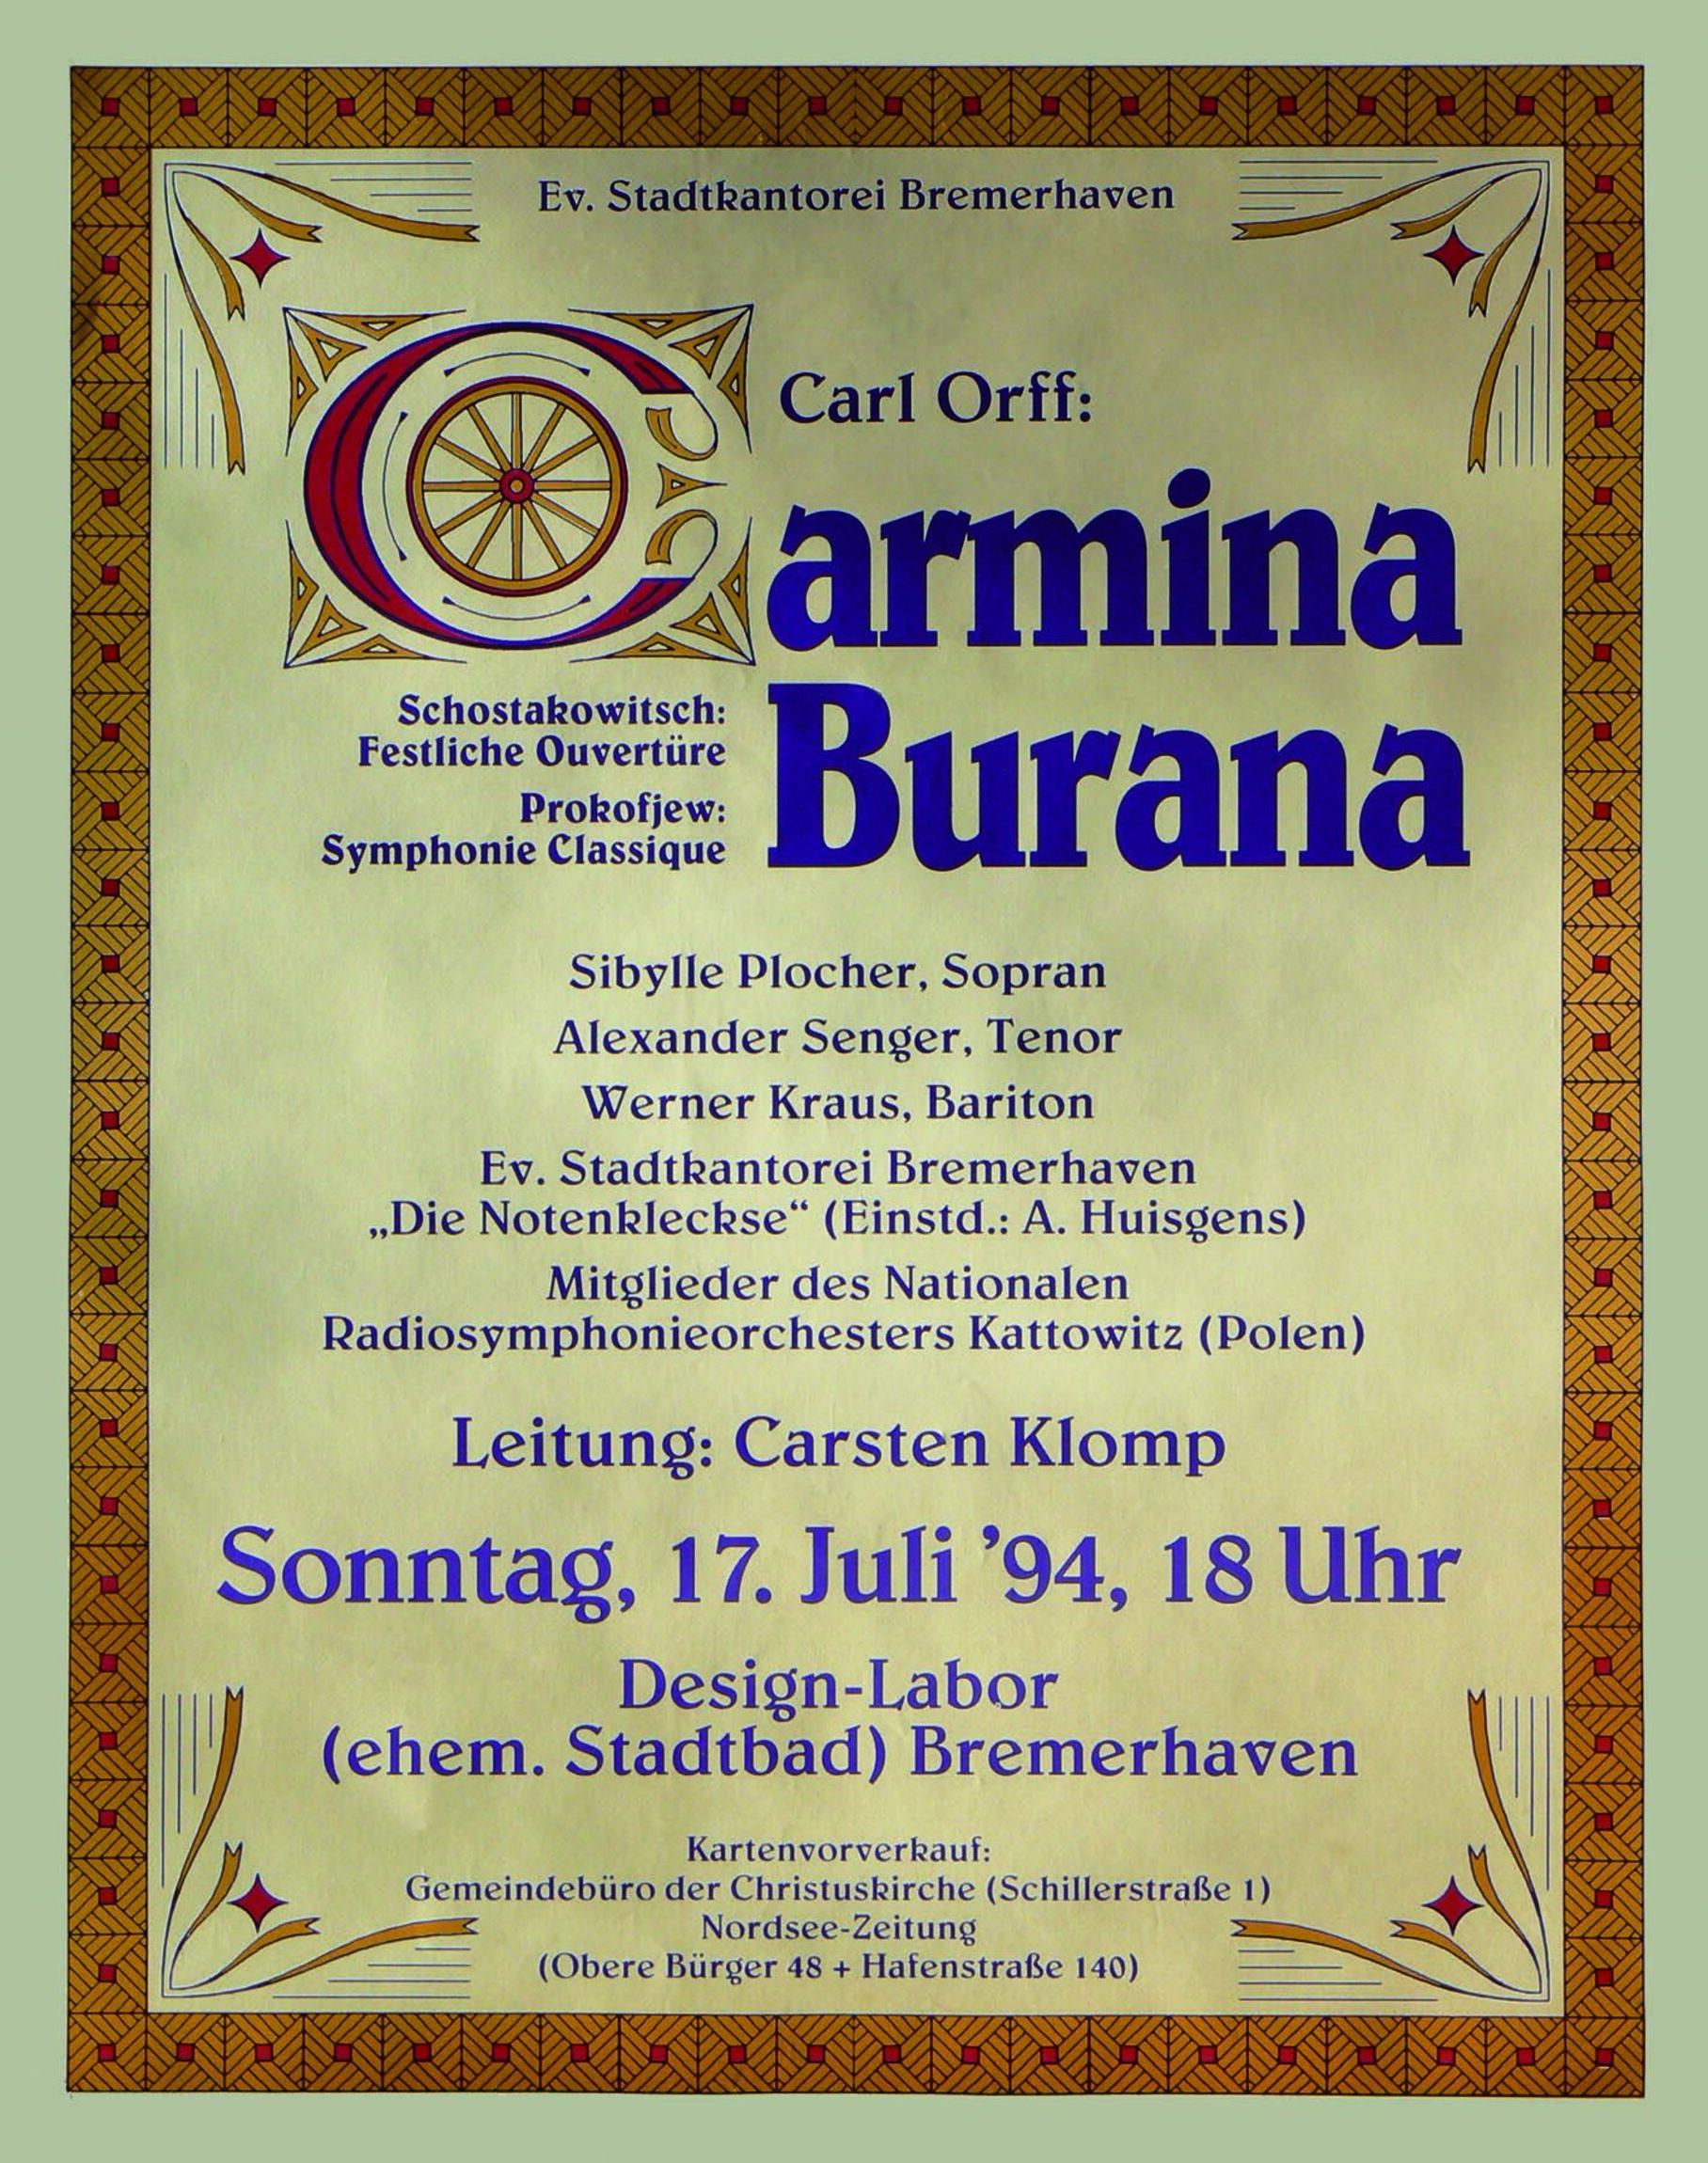 Plakat Carmina 1994